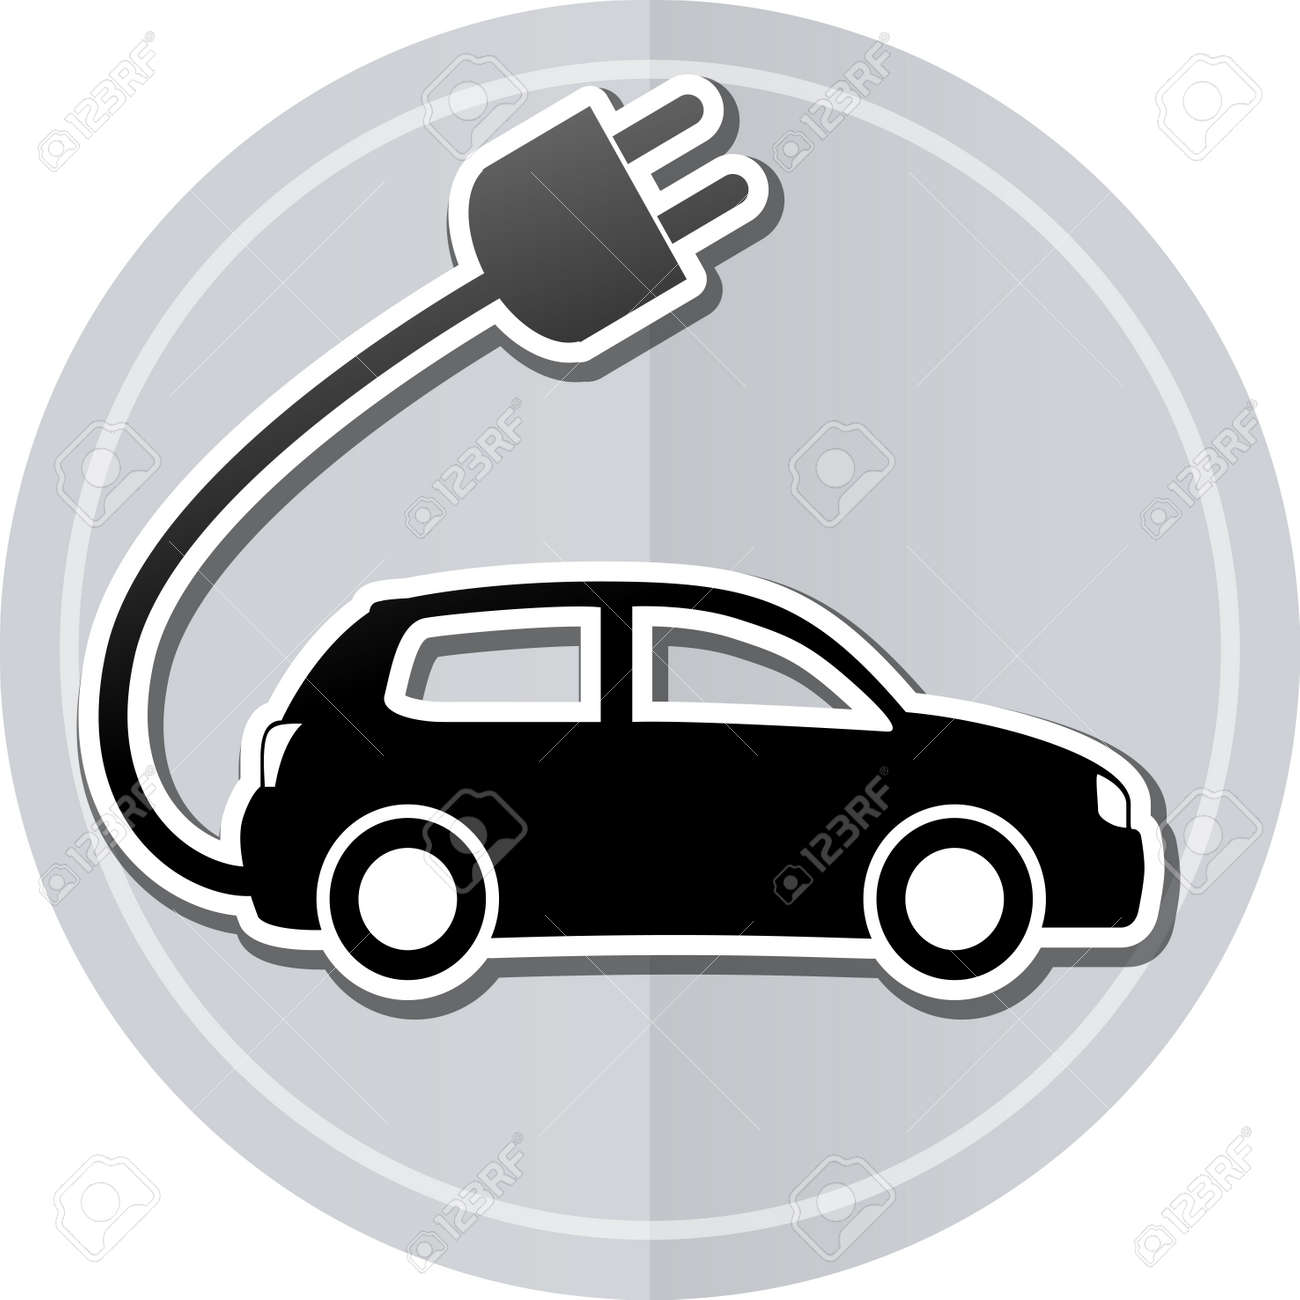 Car sticker design for white car - Illustration Of Electric Car Sticker Icon Simple Design Stock Vector 39757703